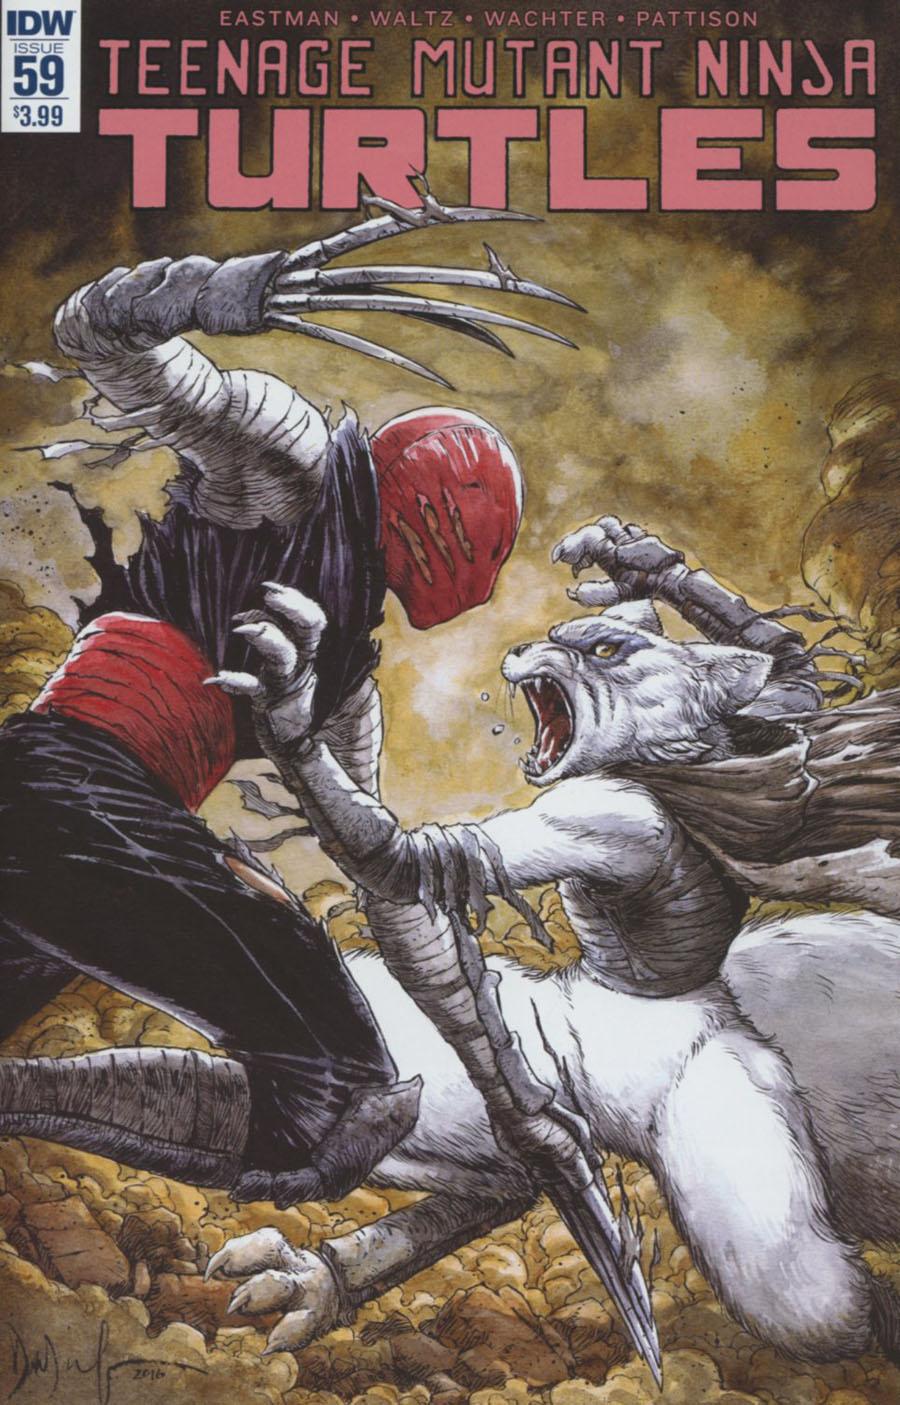 Teenage Mutant Ninja Turtles Vol 5 #59 Cover A 1st Ptg Regular Dave Wachter Cover